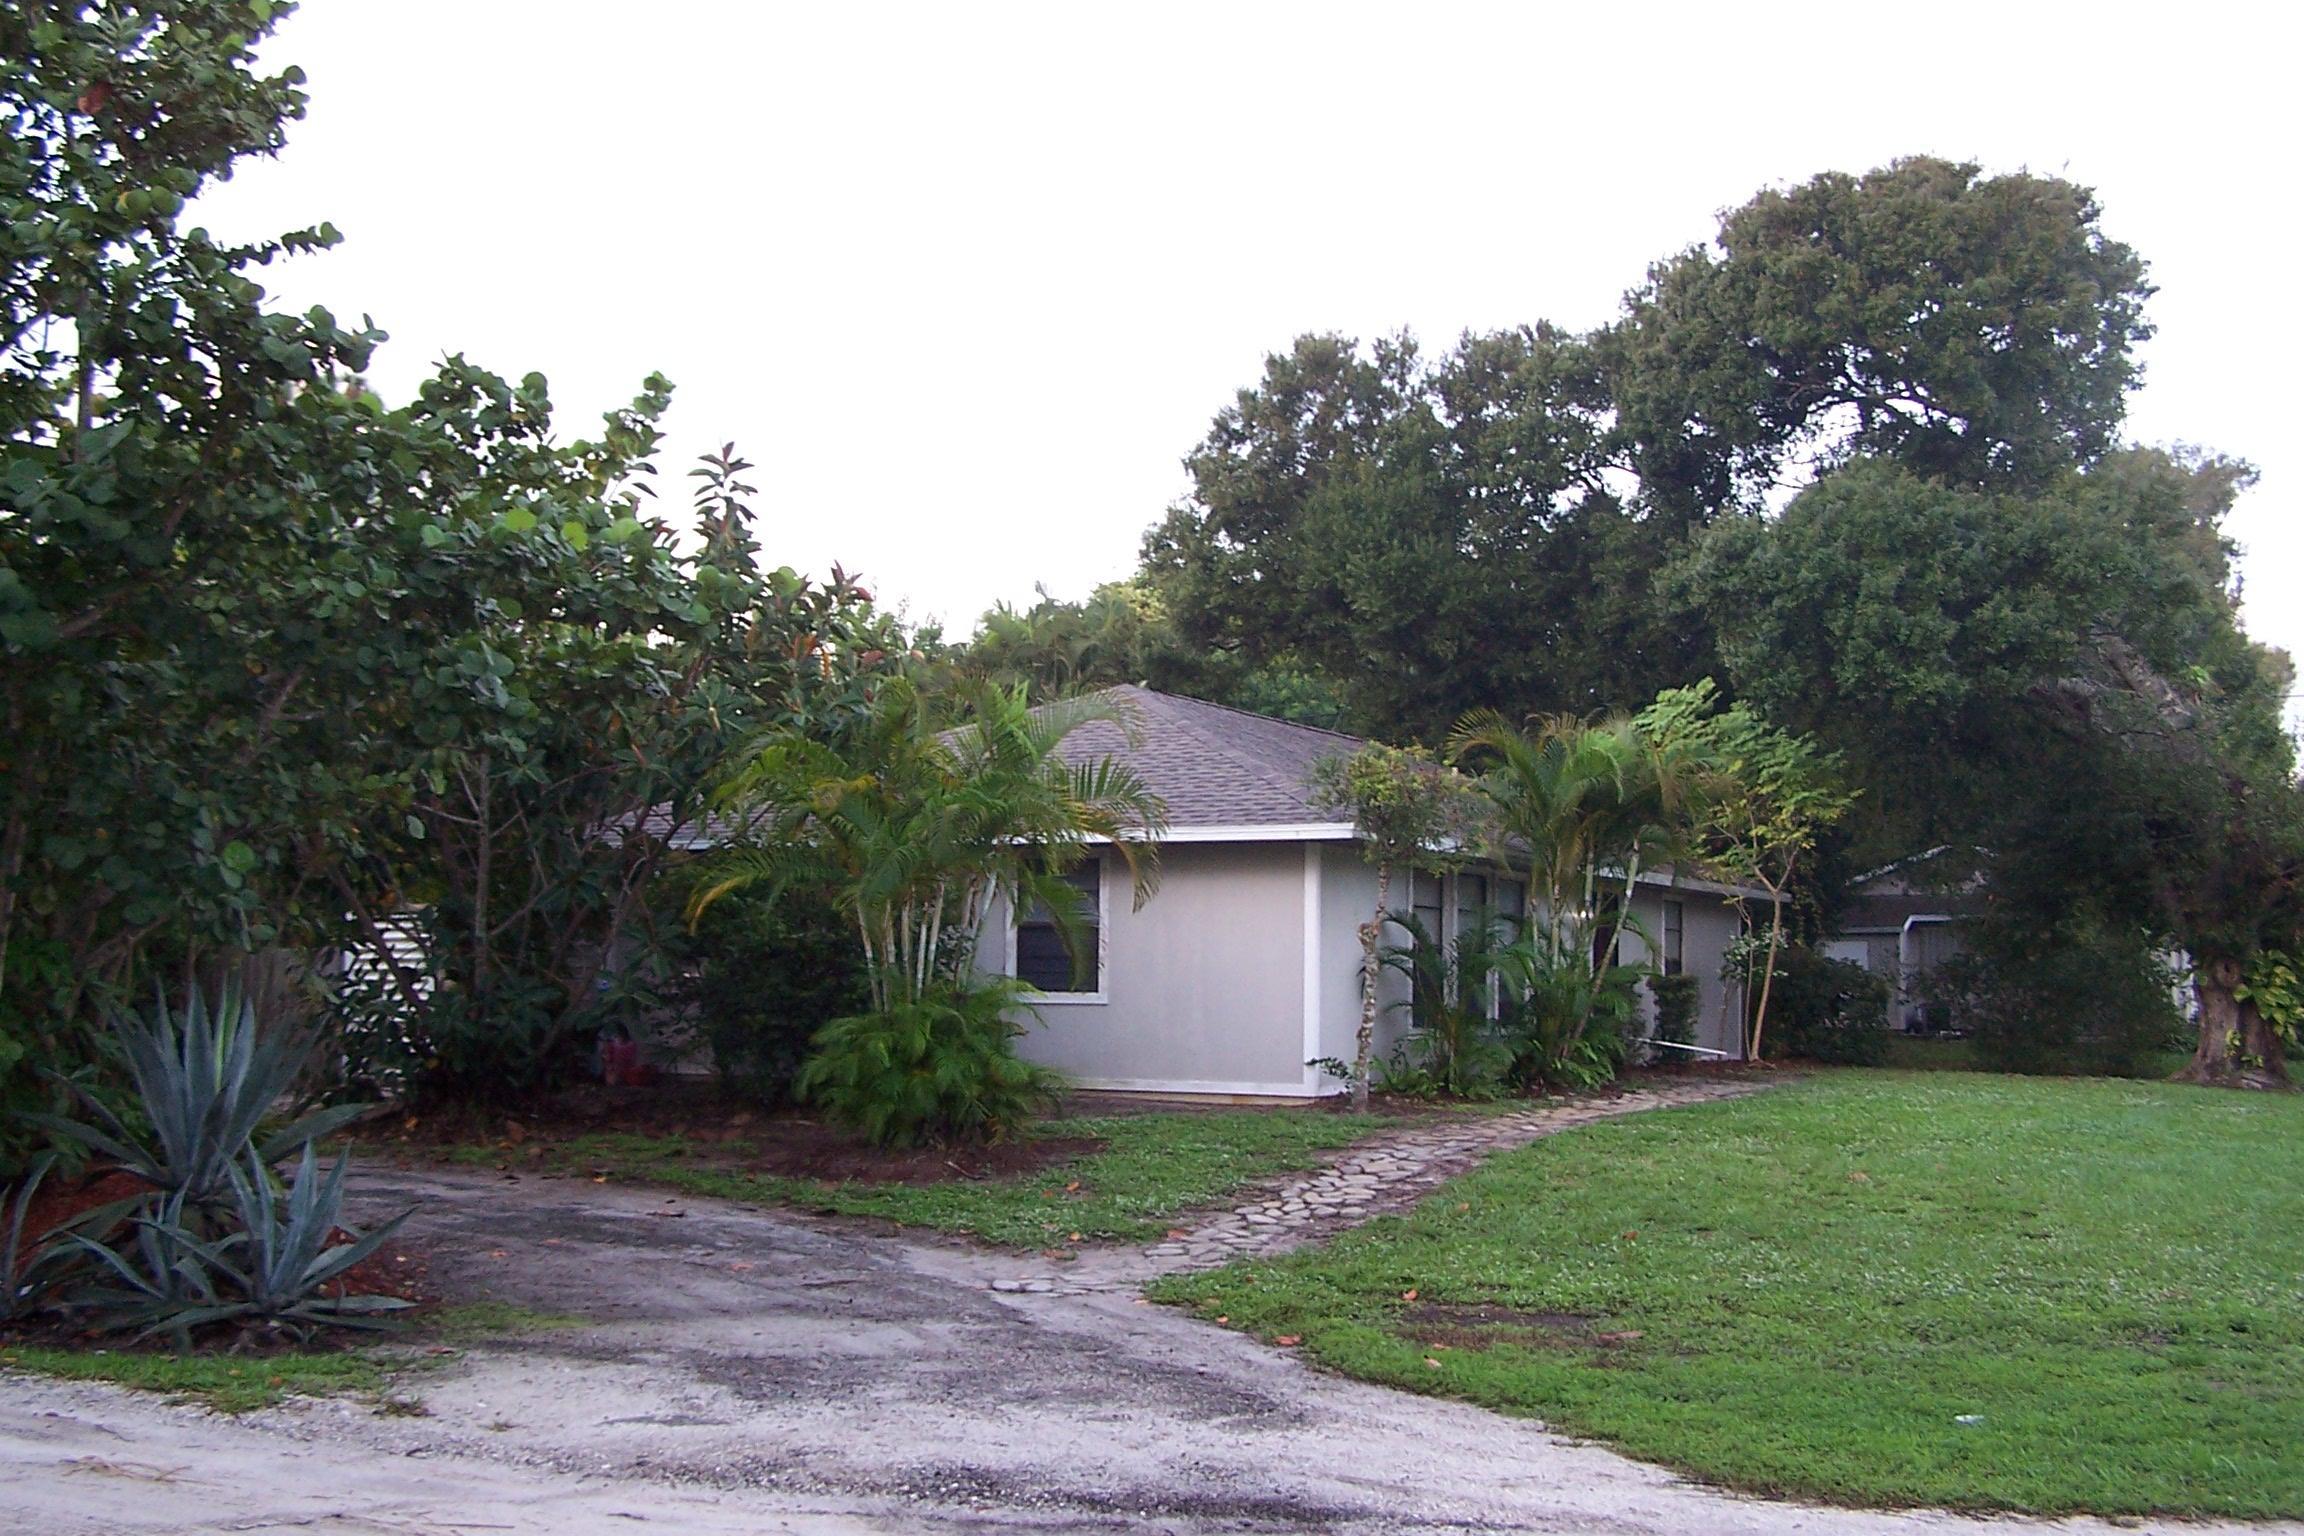 2555 14th Street,Vero Beach,Florida 32962,3 Bedrooms Bedrooms,2 BathroomsBathrooms,Single family detached,14th,RX-10566843